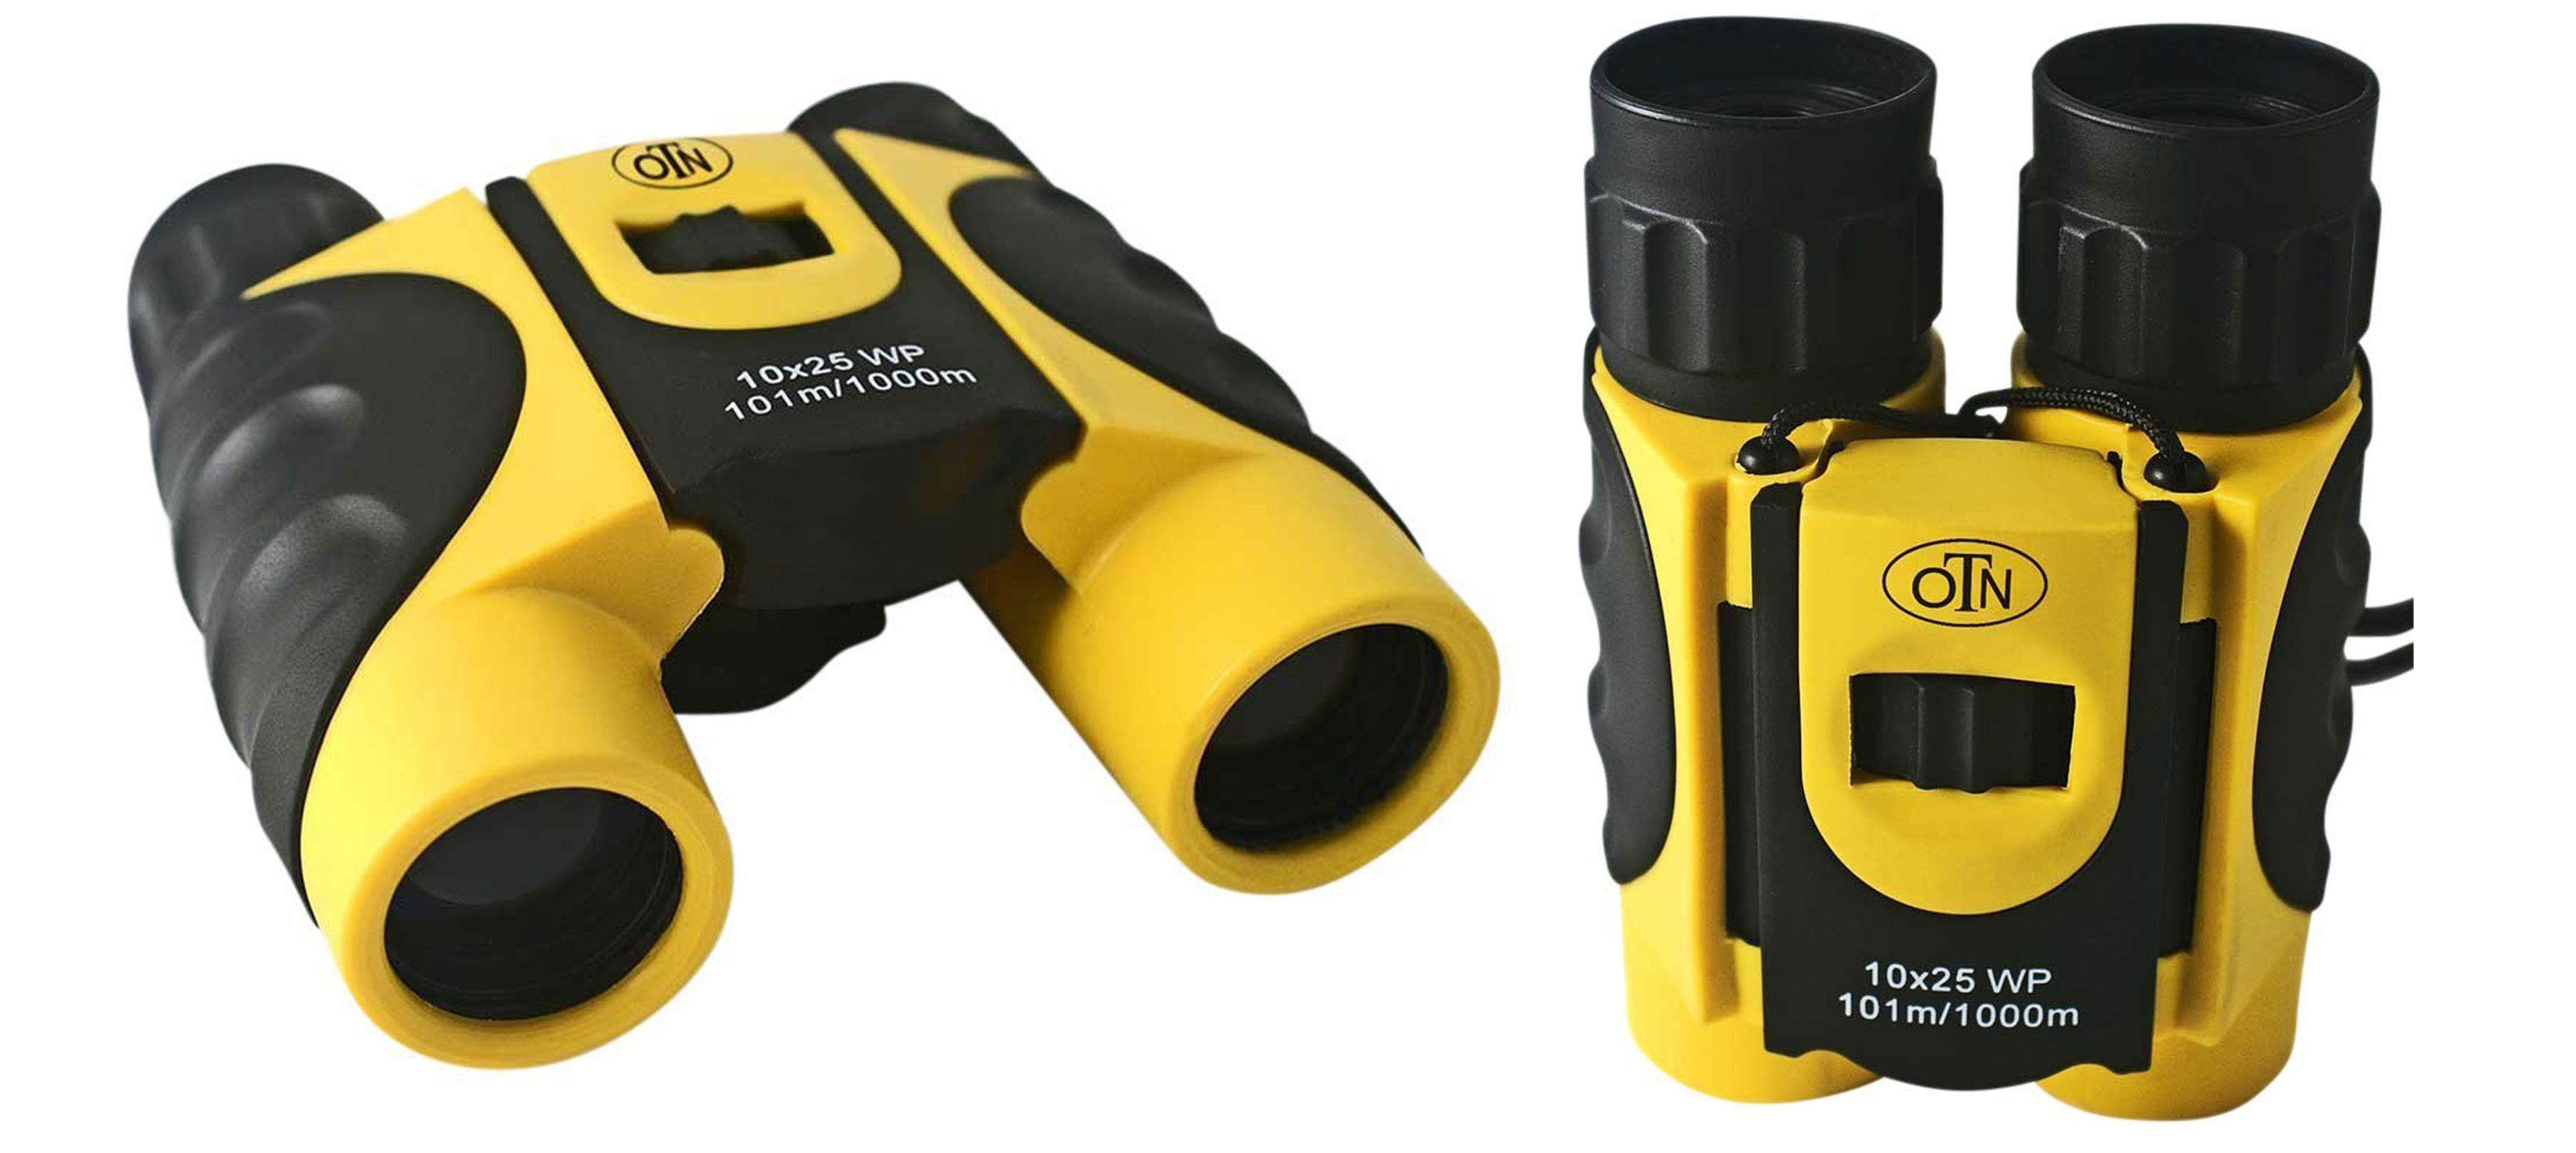 OutNowTech Ultra Compact Folding Binoculars 10x25